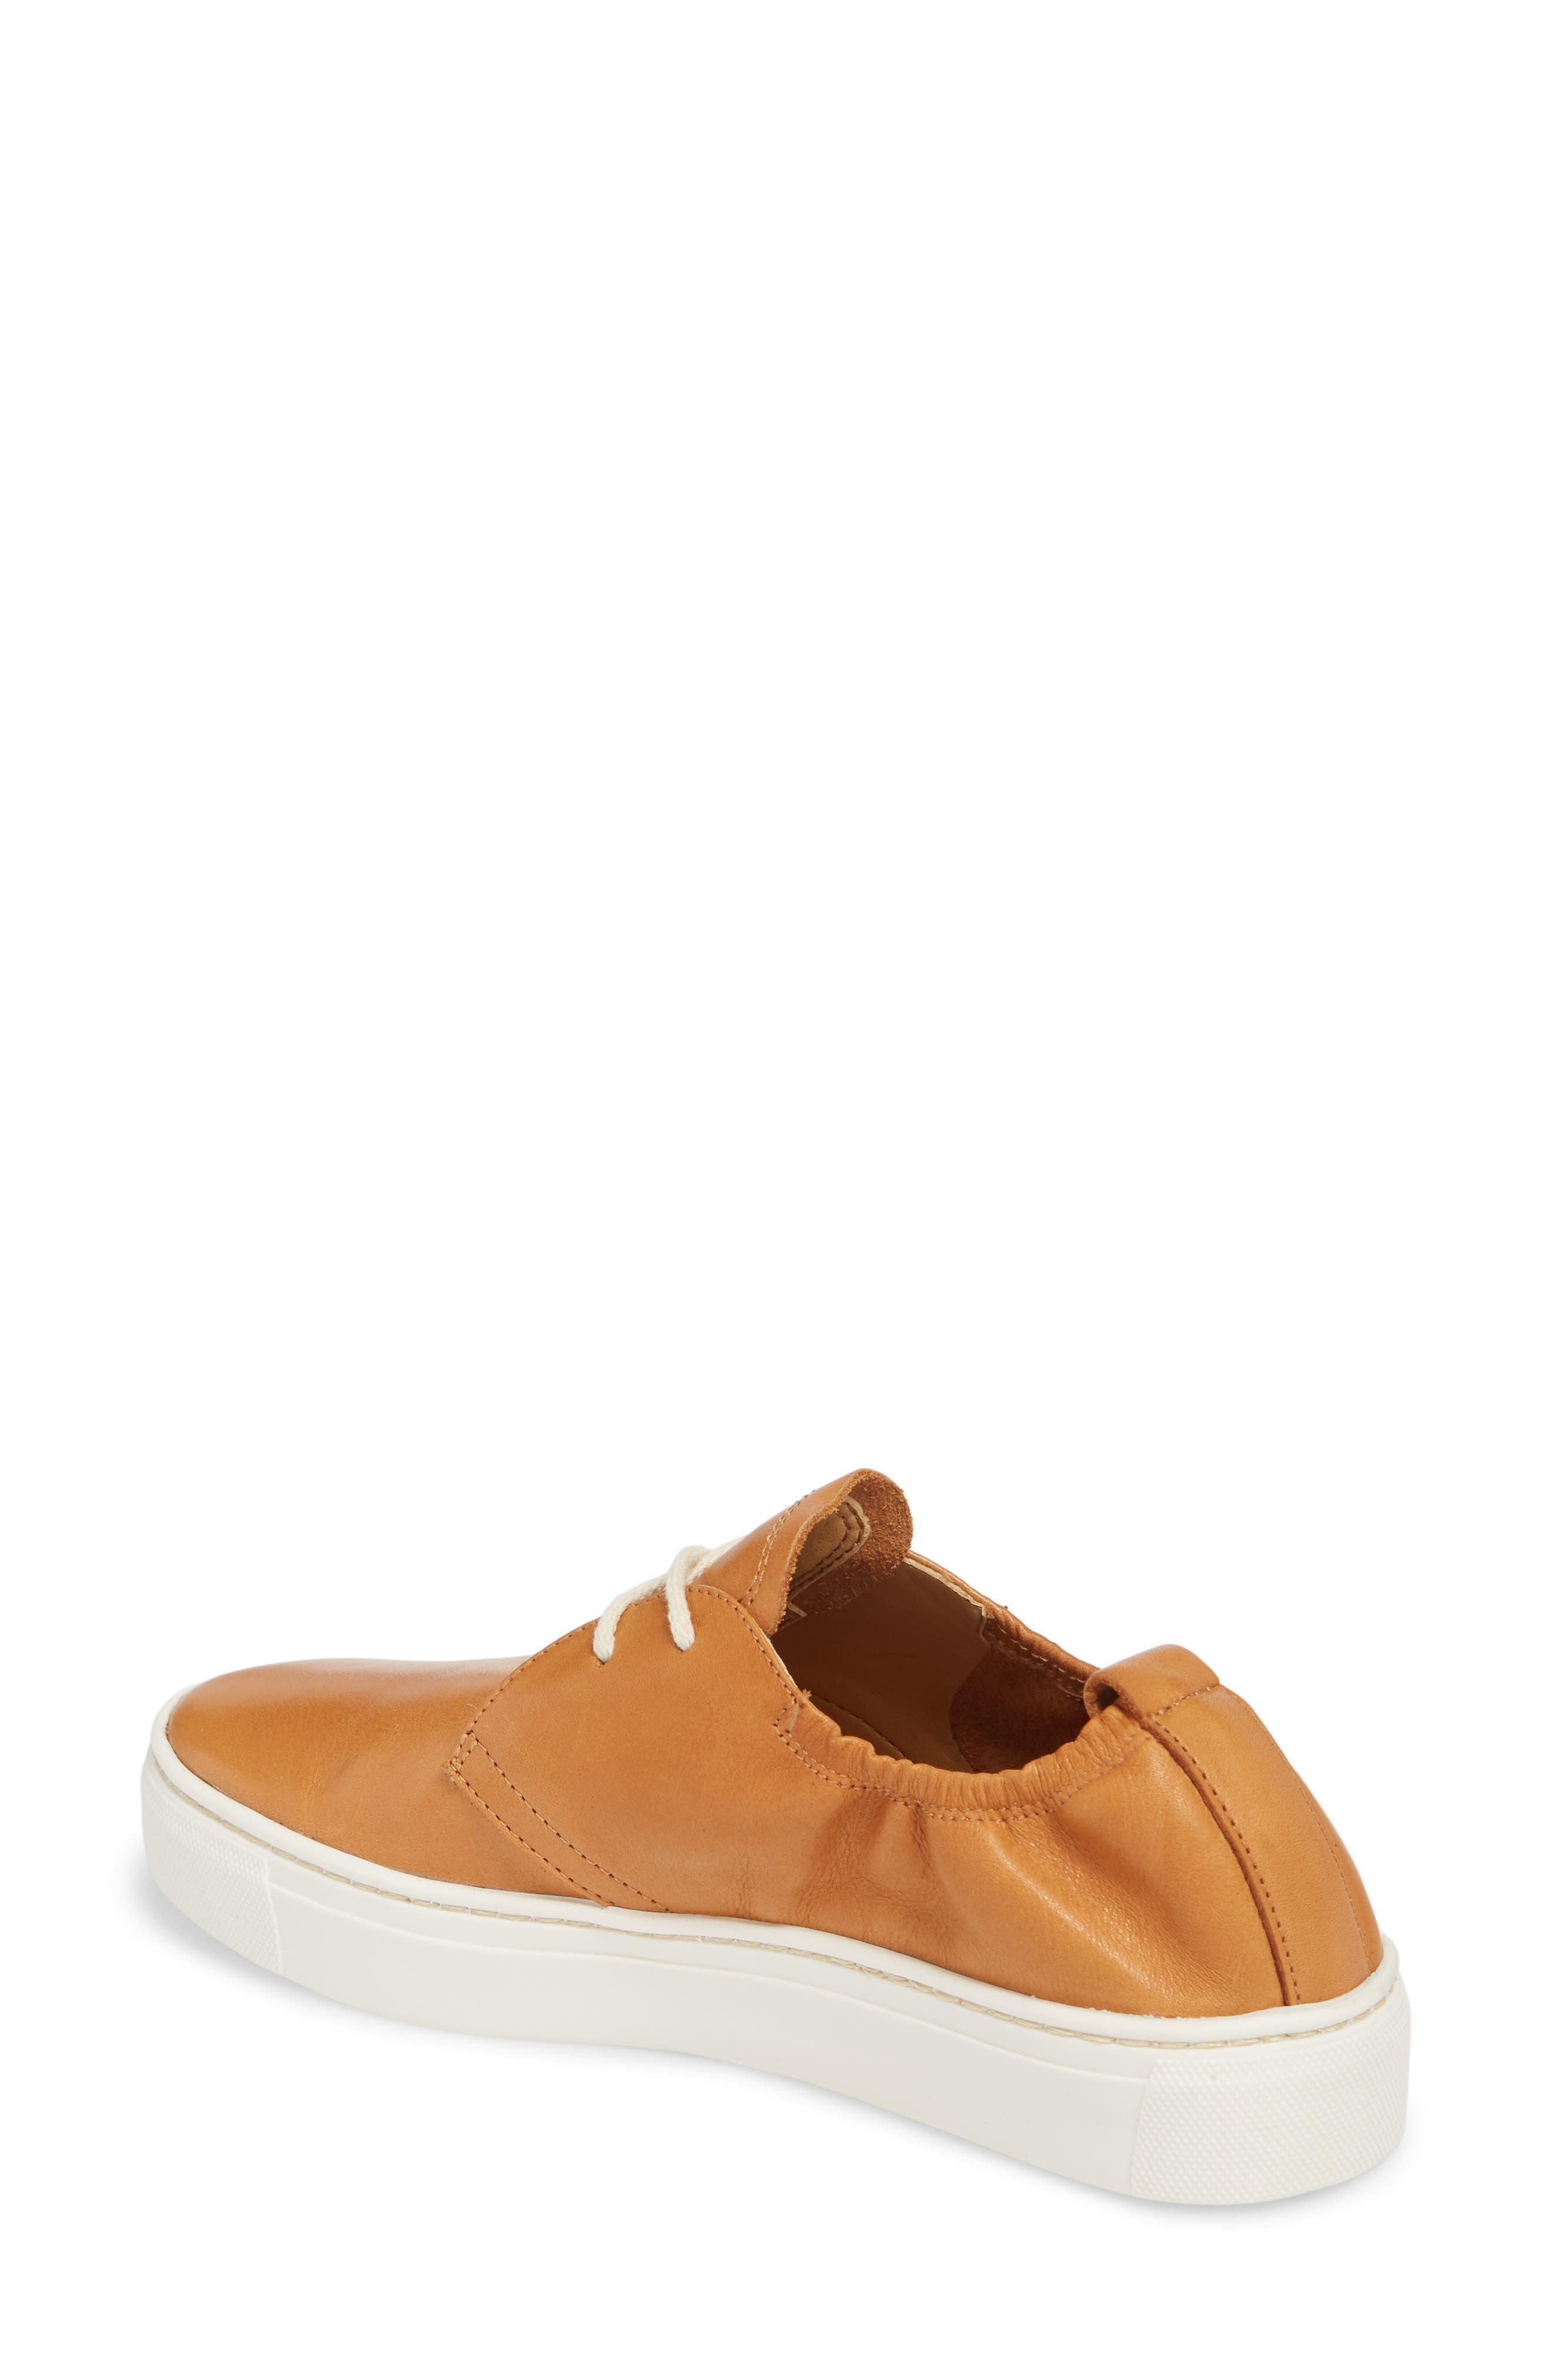 Sneak Up Sneaker,                             Alternate thumbnail 2, color,                             Cognac Leather